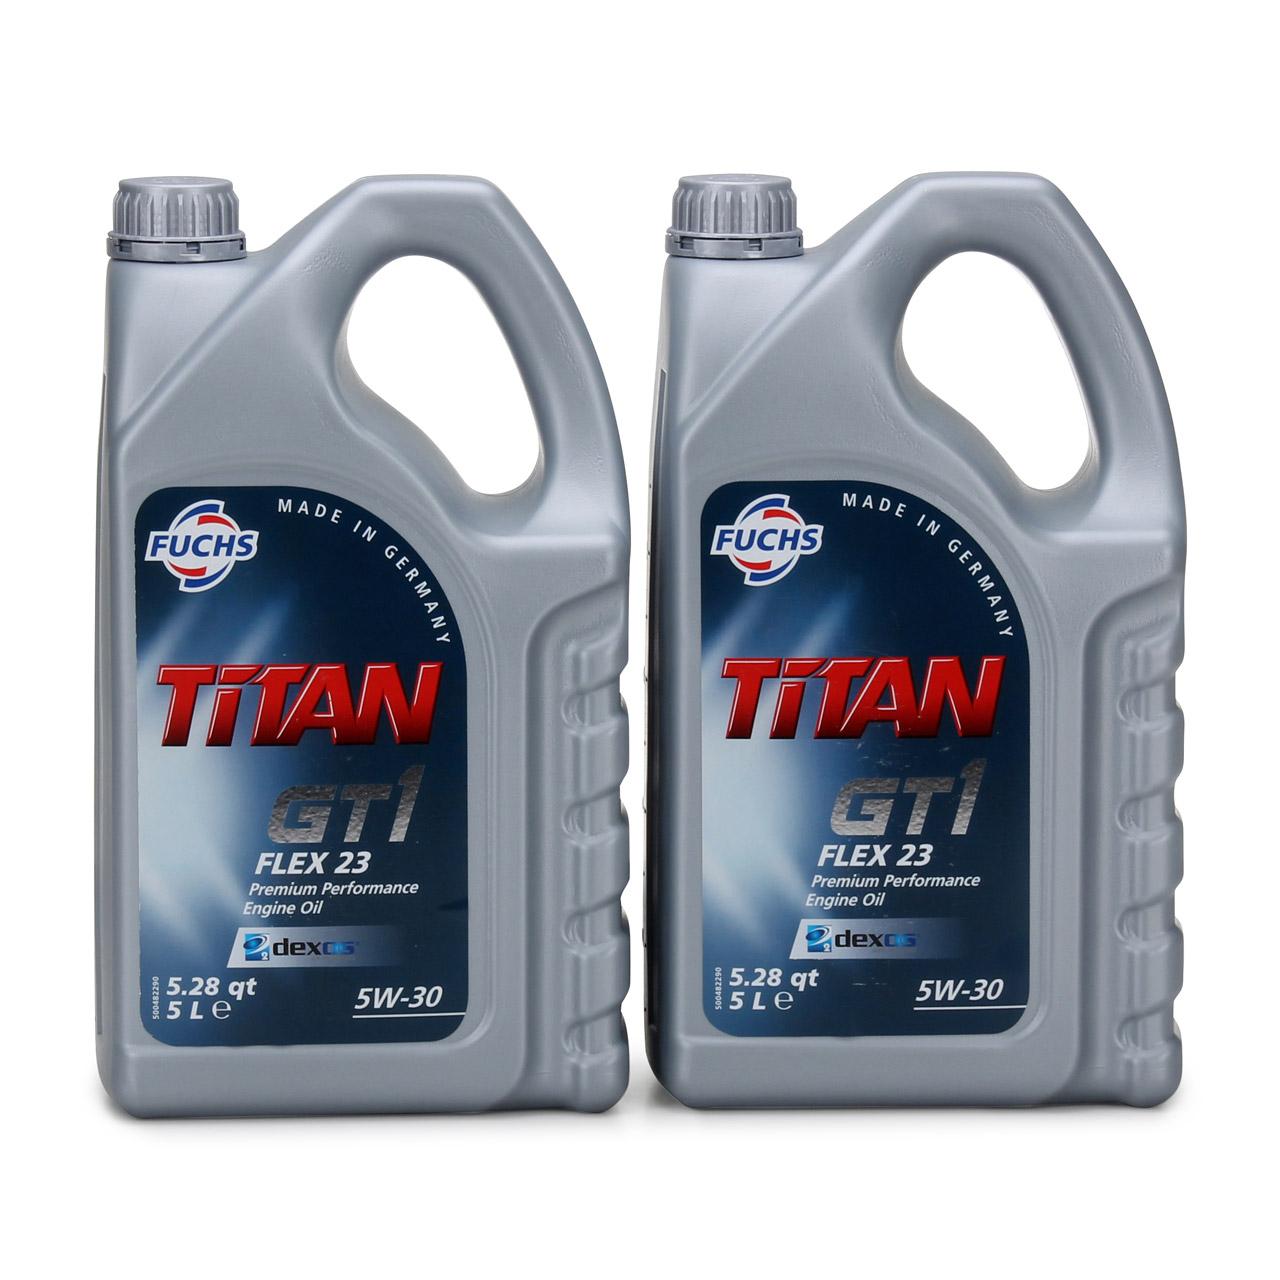 FUCHS Motoröl TITAN GT1 Flex 23 5W30 5W-30 dexos2 LL-04 505.00/505.01 10 Liter